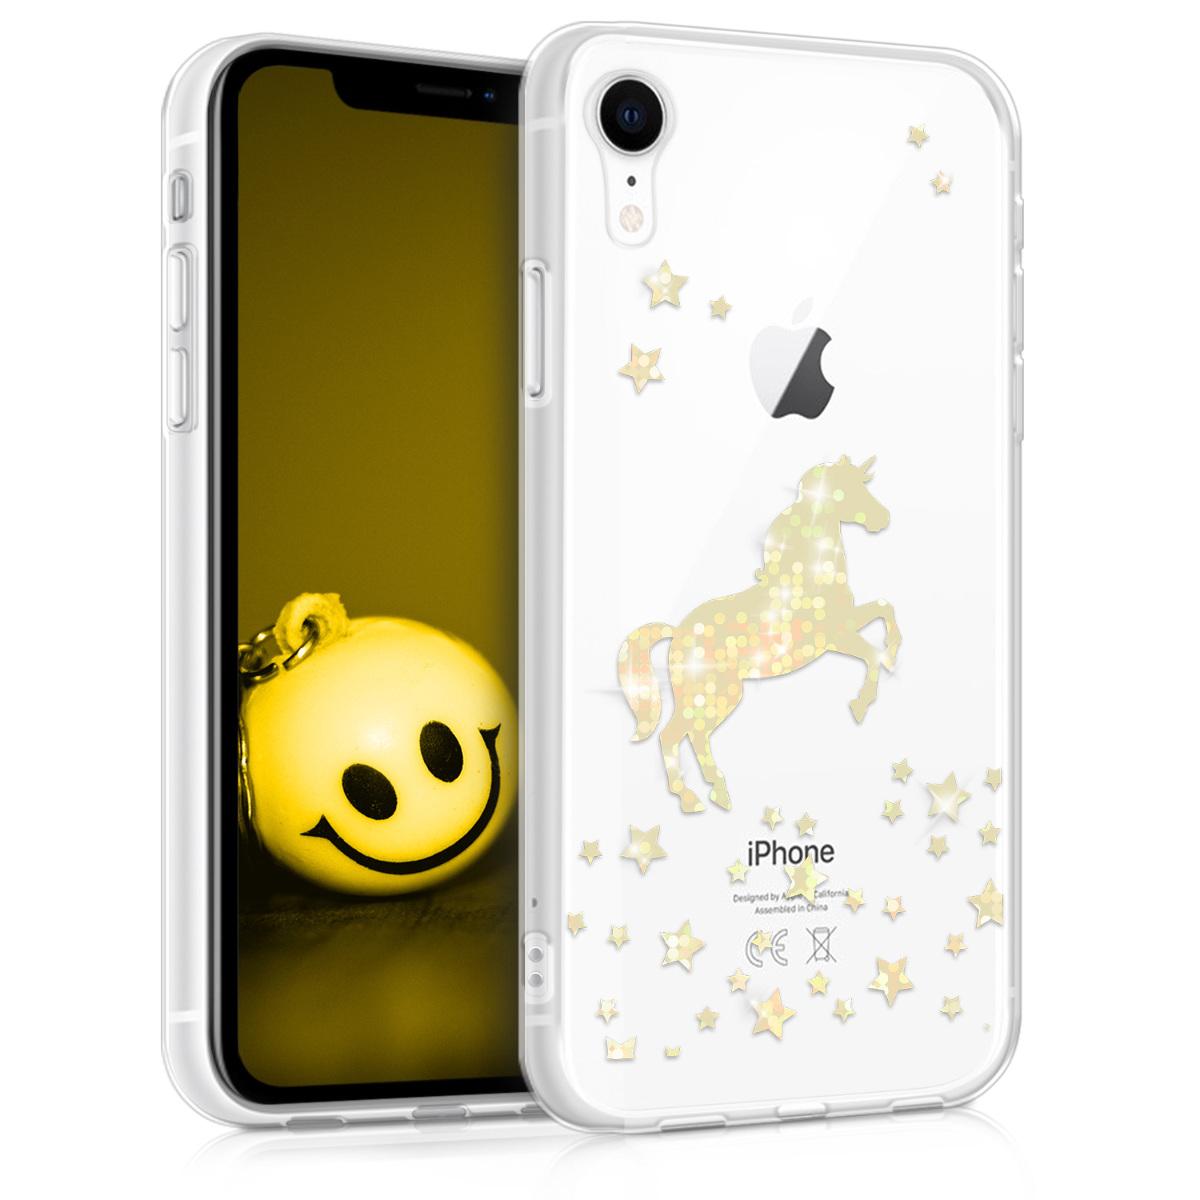 KW Θήκη Σιλικόνης Apple iPhone XR - Rose Gold / Transparent (45912.32)